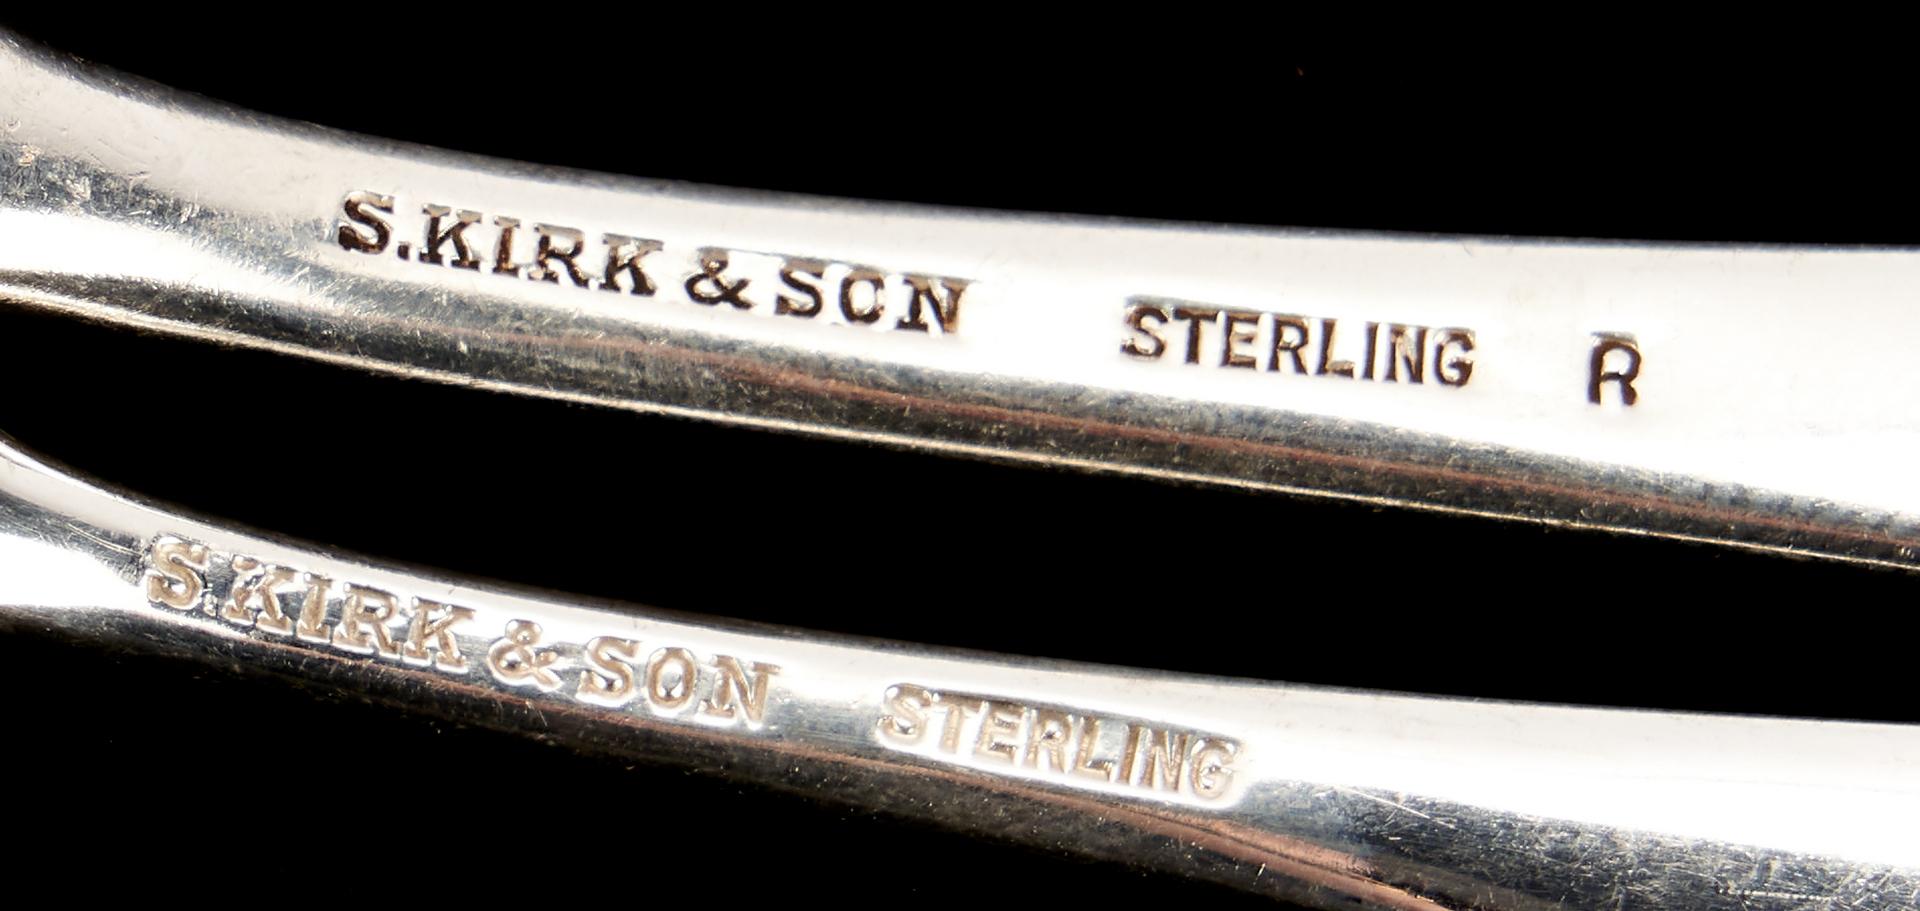 Lot 284: 96 pcs. S. Kirk & Son Sterling Silver Flatware, incl. Repousse, Rose